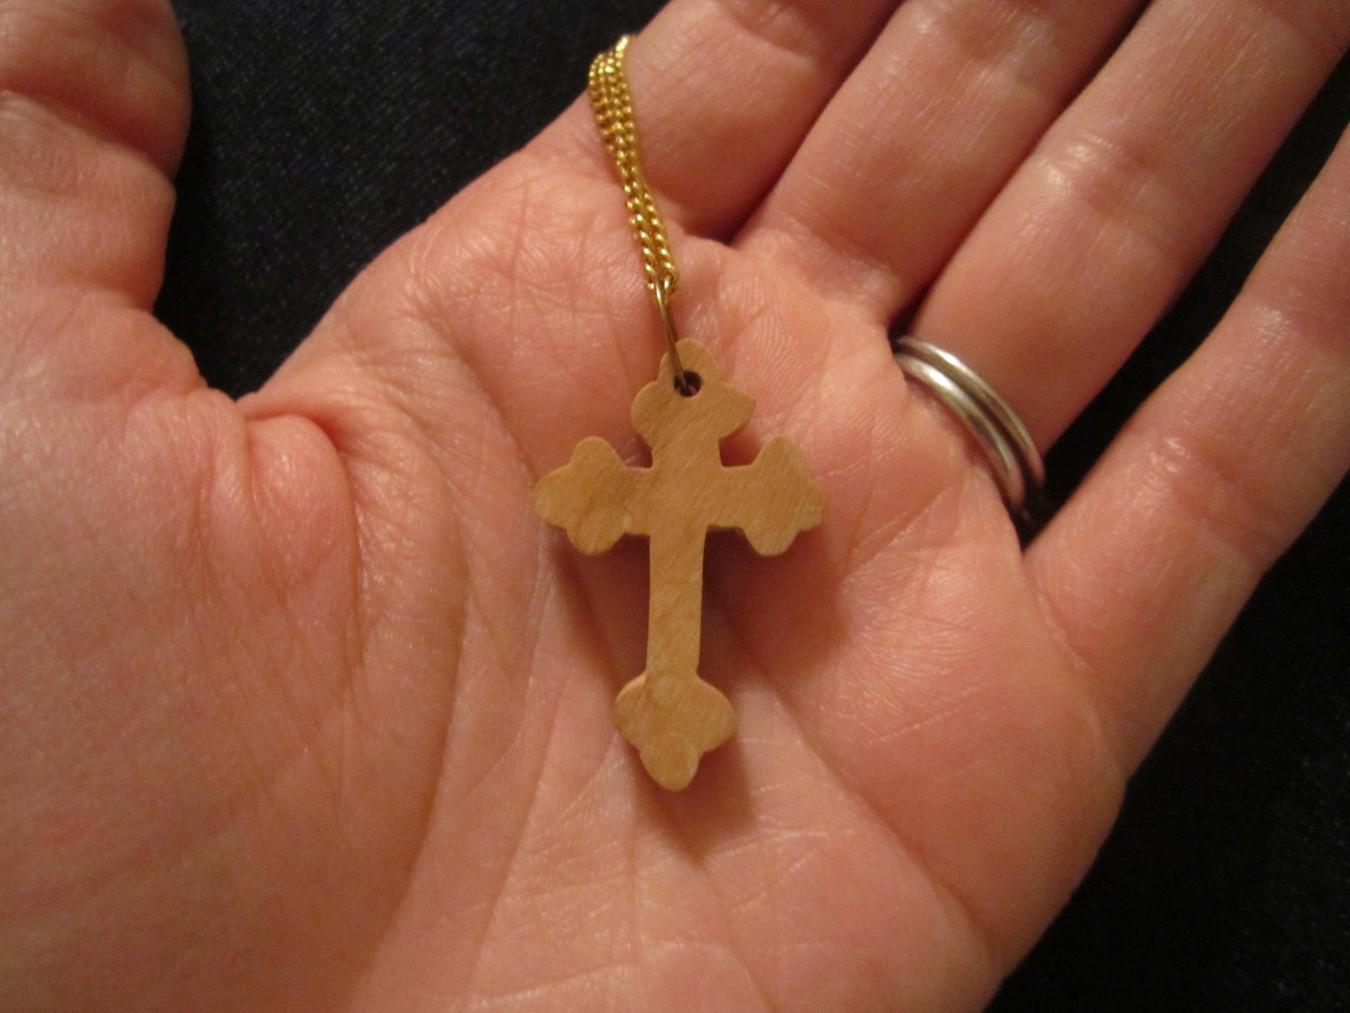 The Ordinary Cross: A Good Friday Reflection